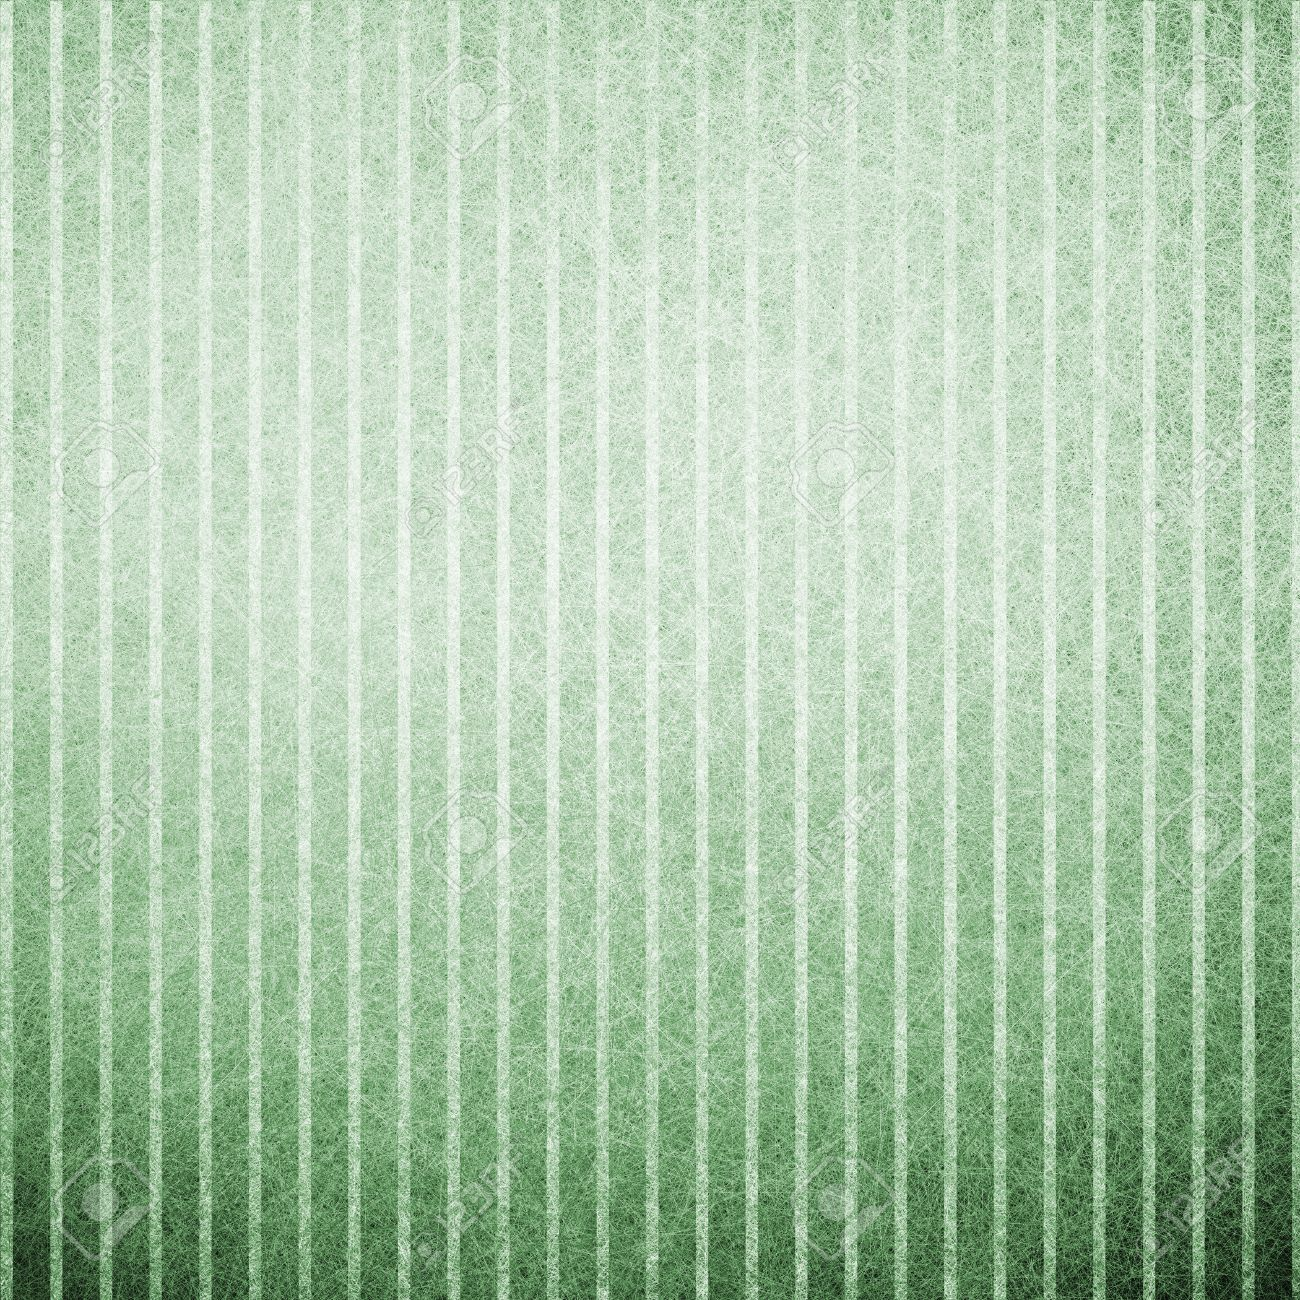 Pinstripe Pattern Simple Design